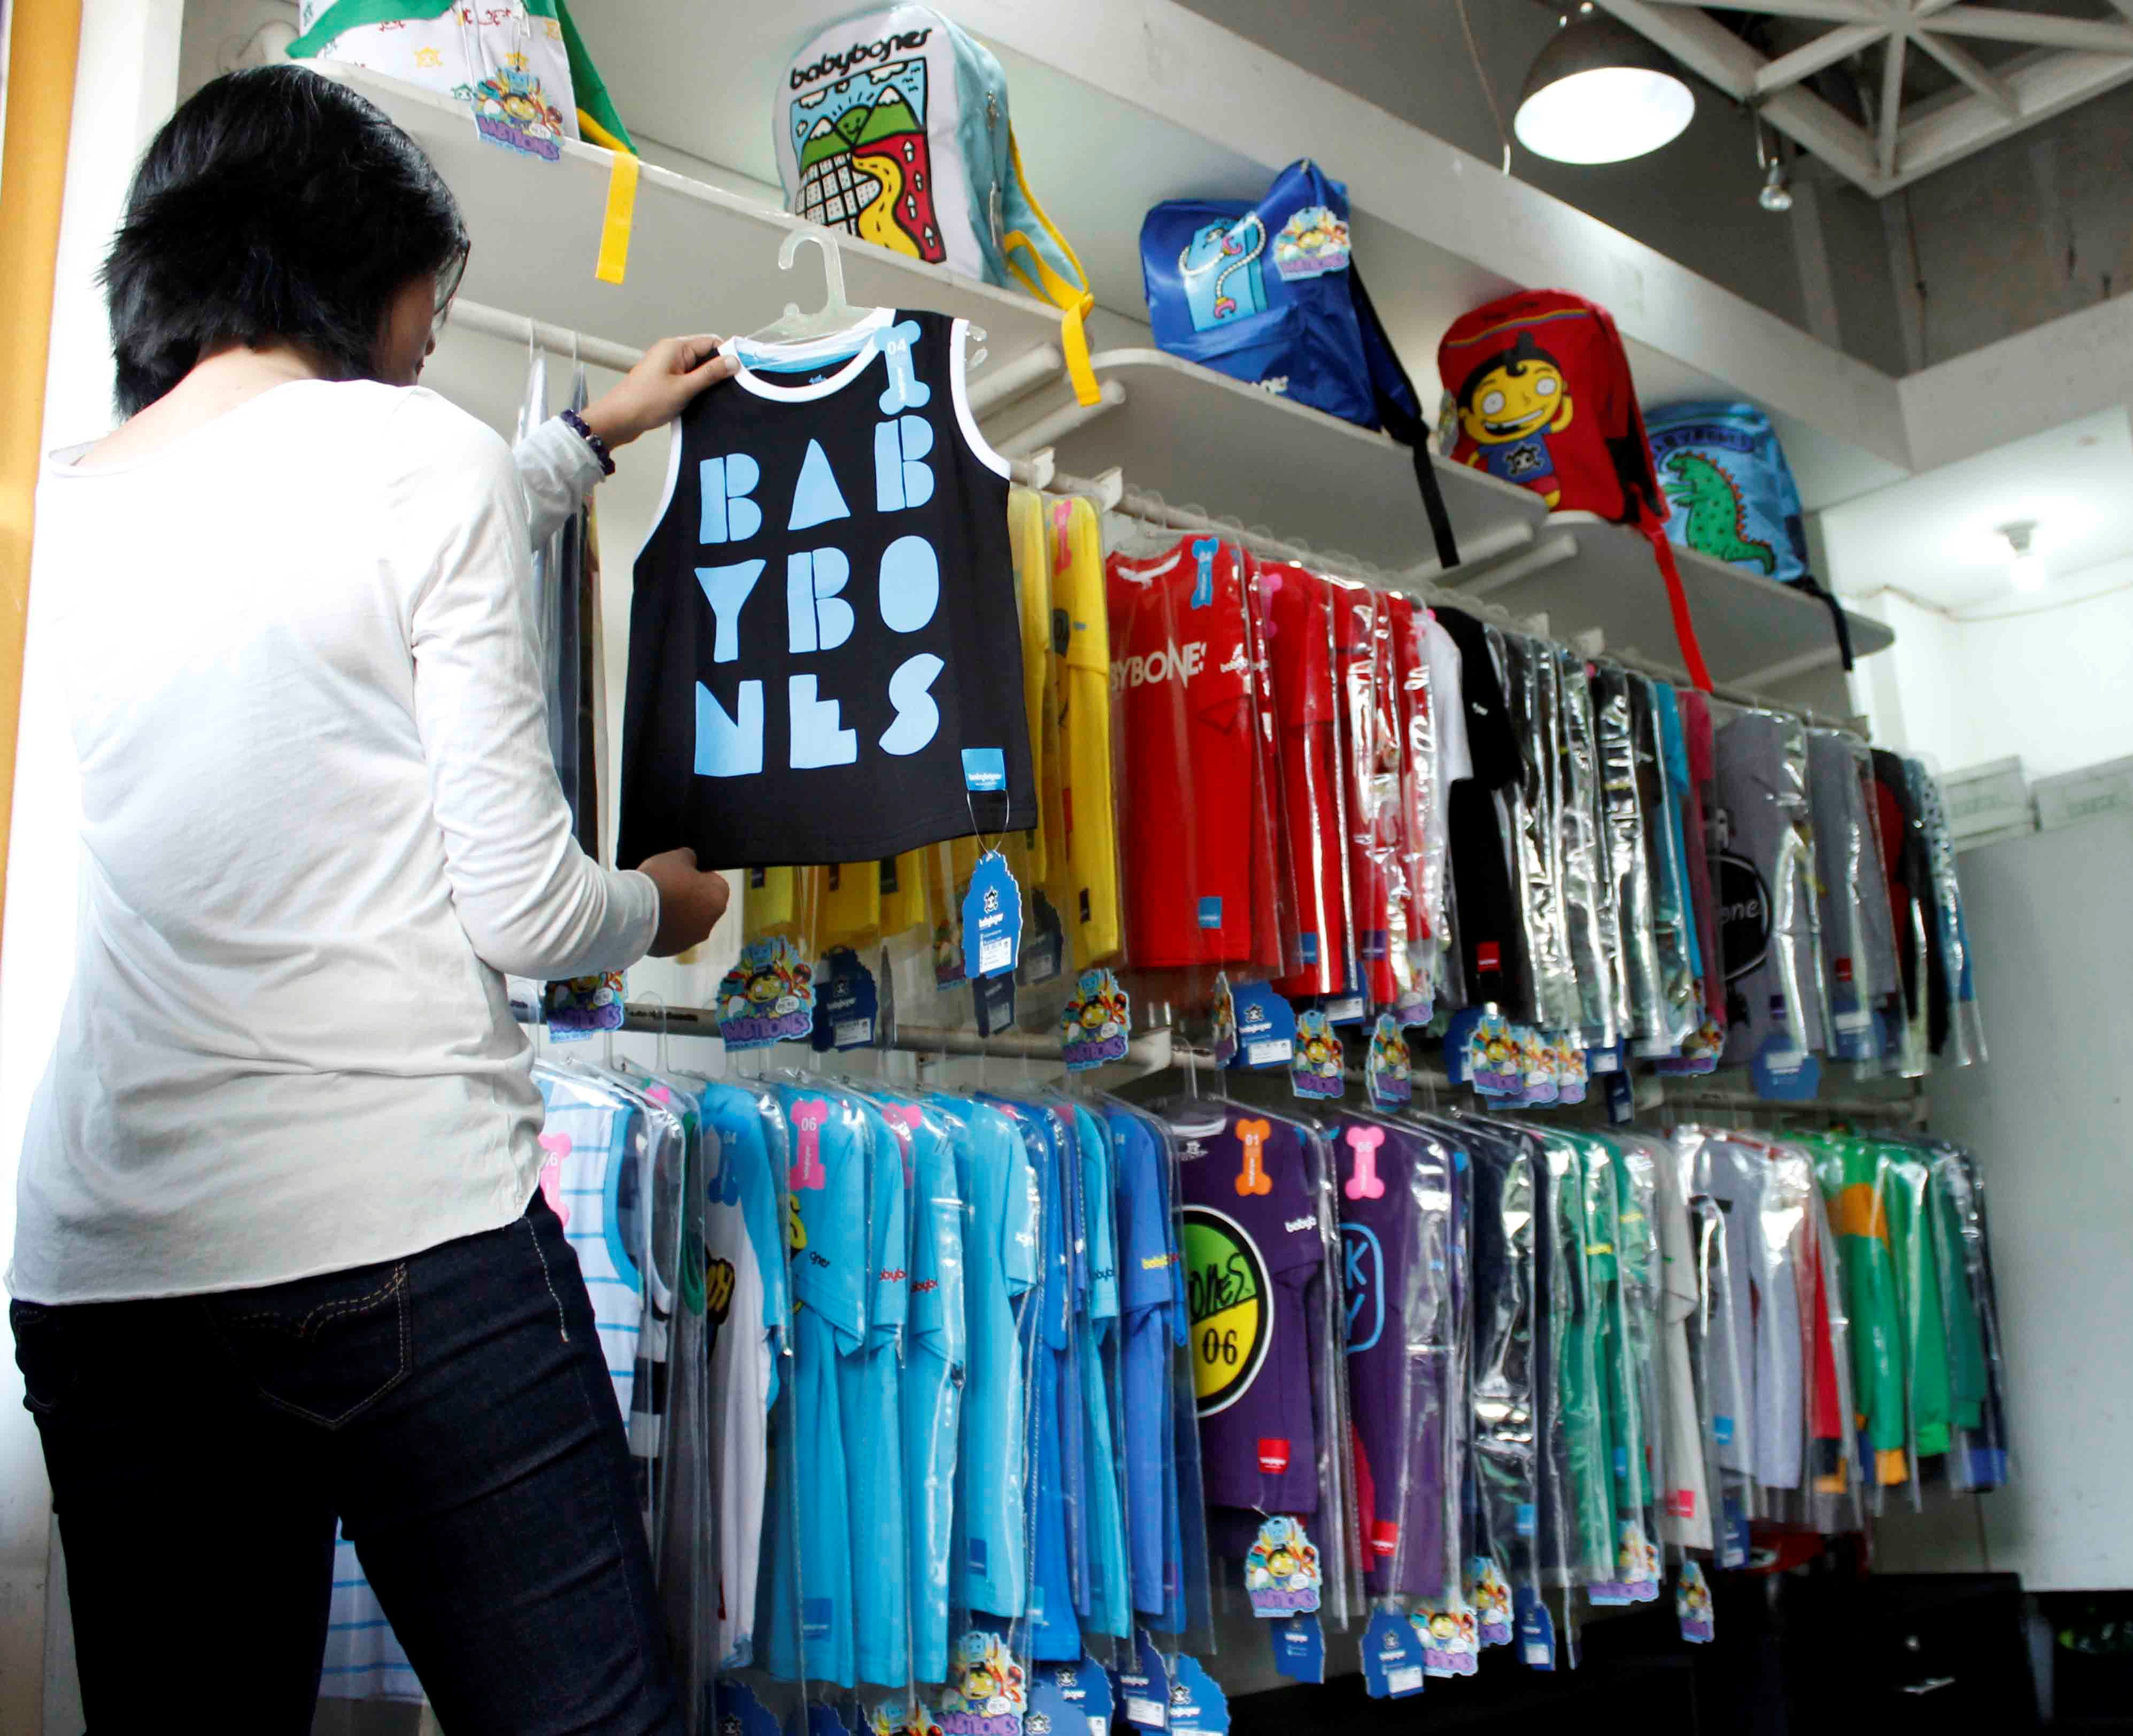 Grosir Baju Anak Di Cimahi Bandung yang Terkenal Murah